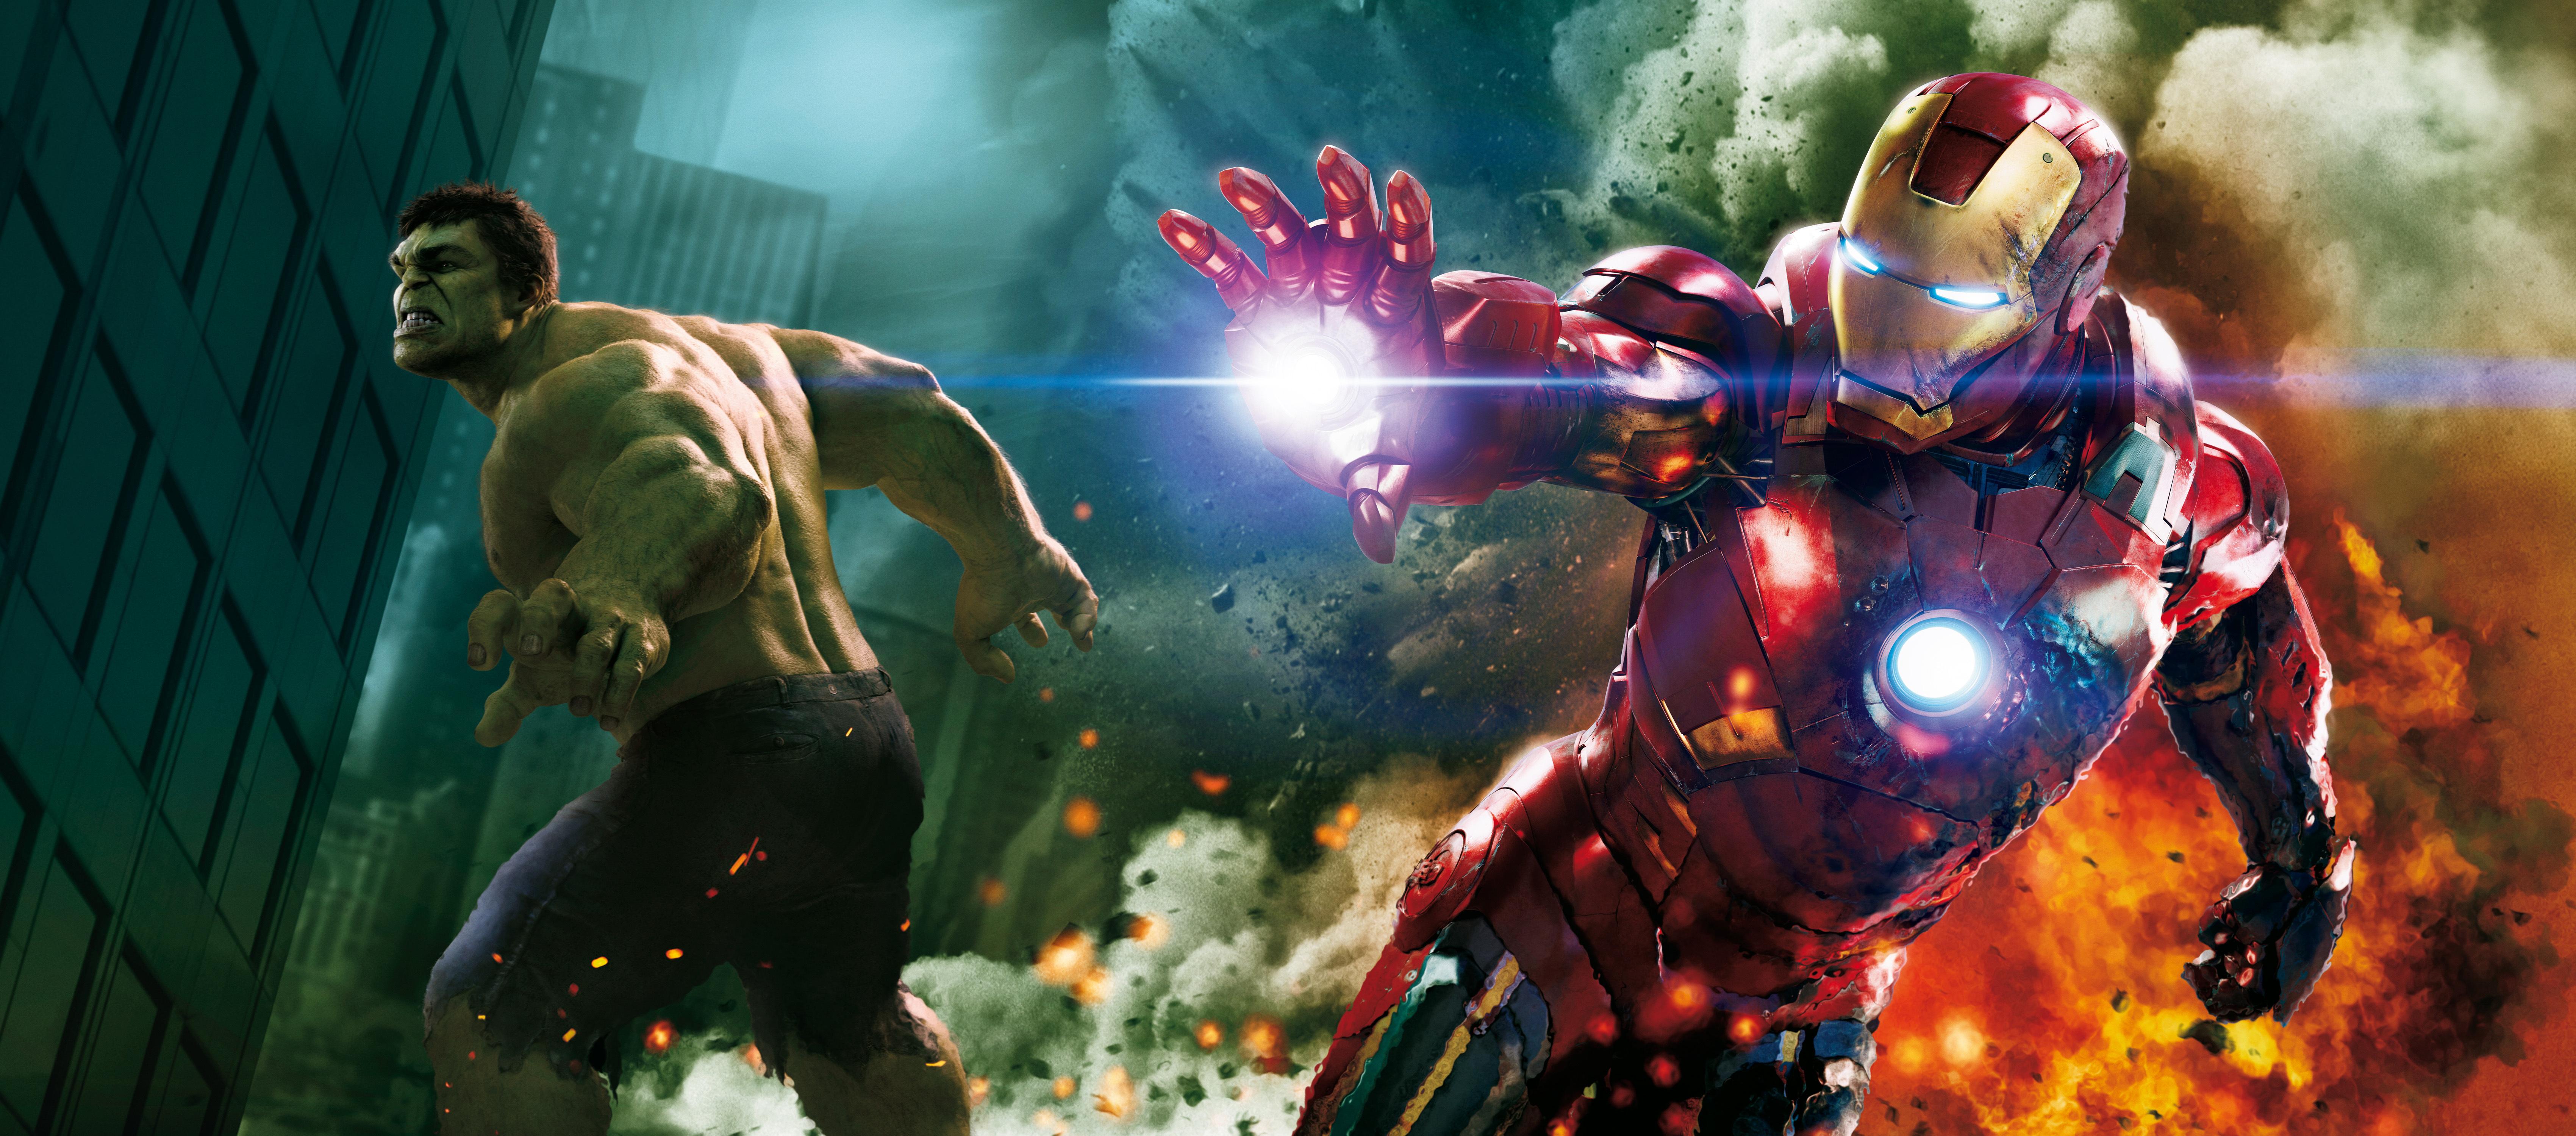 4K wallpaper   Films   iron man The Avengers the battle Halak 6800x3000